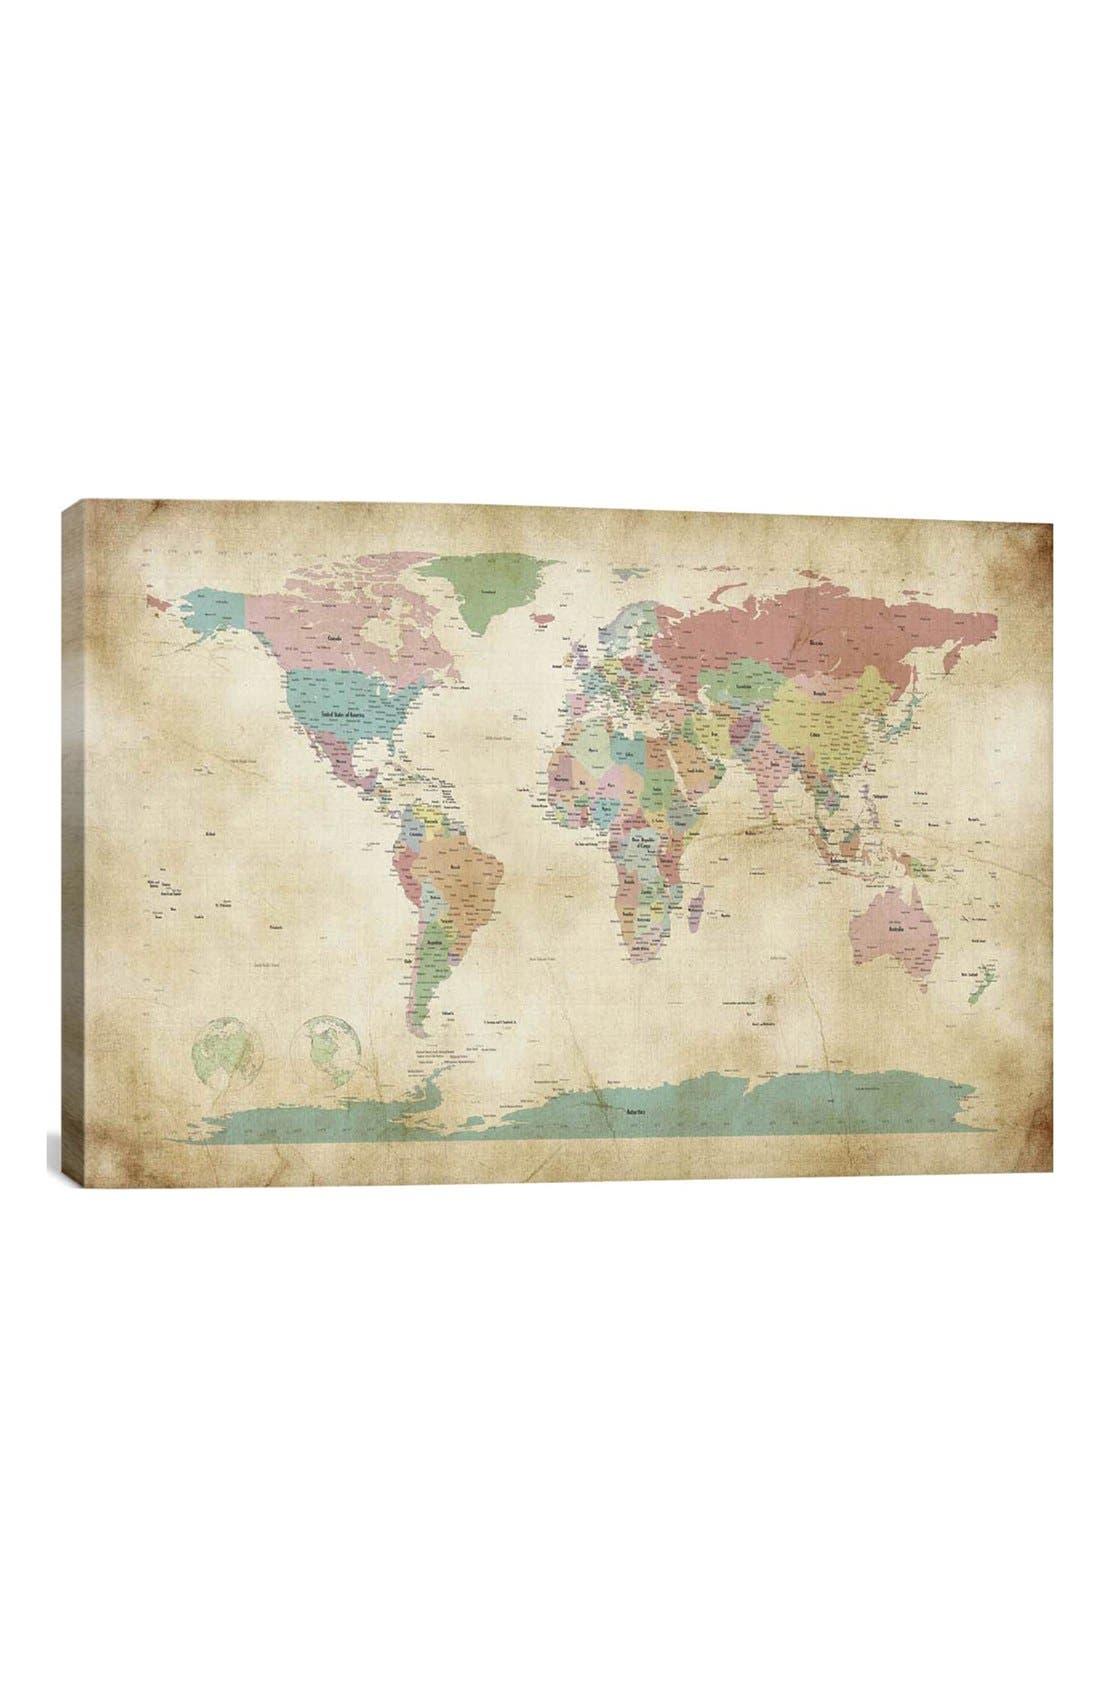 'World Cities Map - Michael Thompsett' Giclée Print Canvas Art,                             Main thumbnail 1, color,                             Brown/ Multi